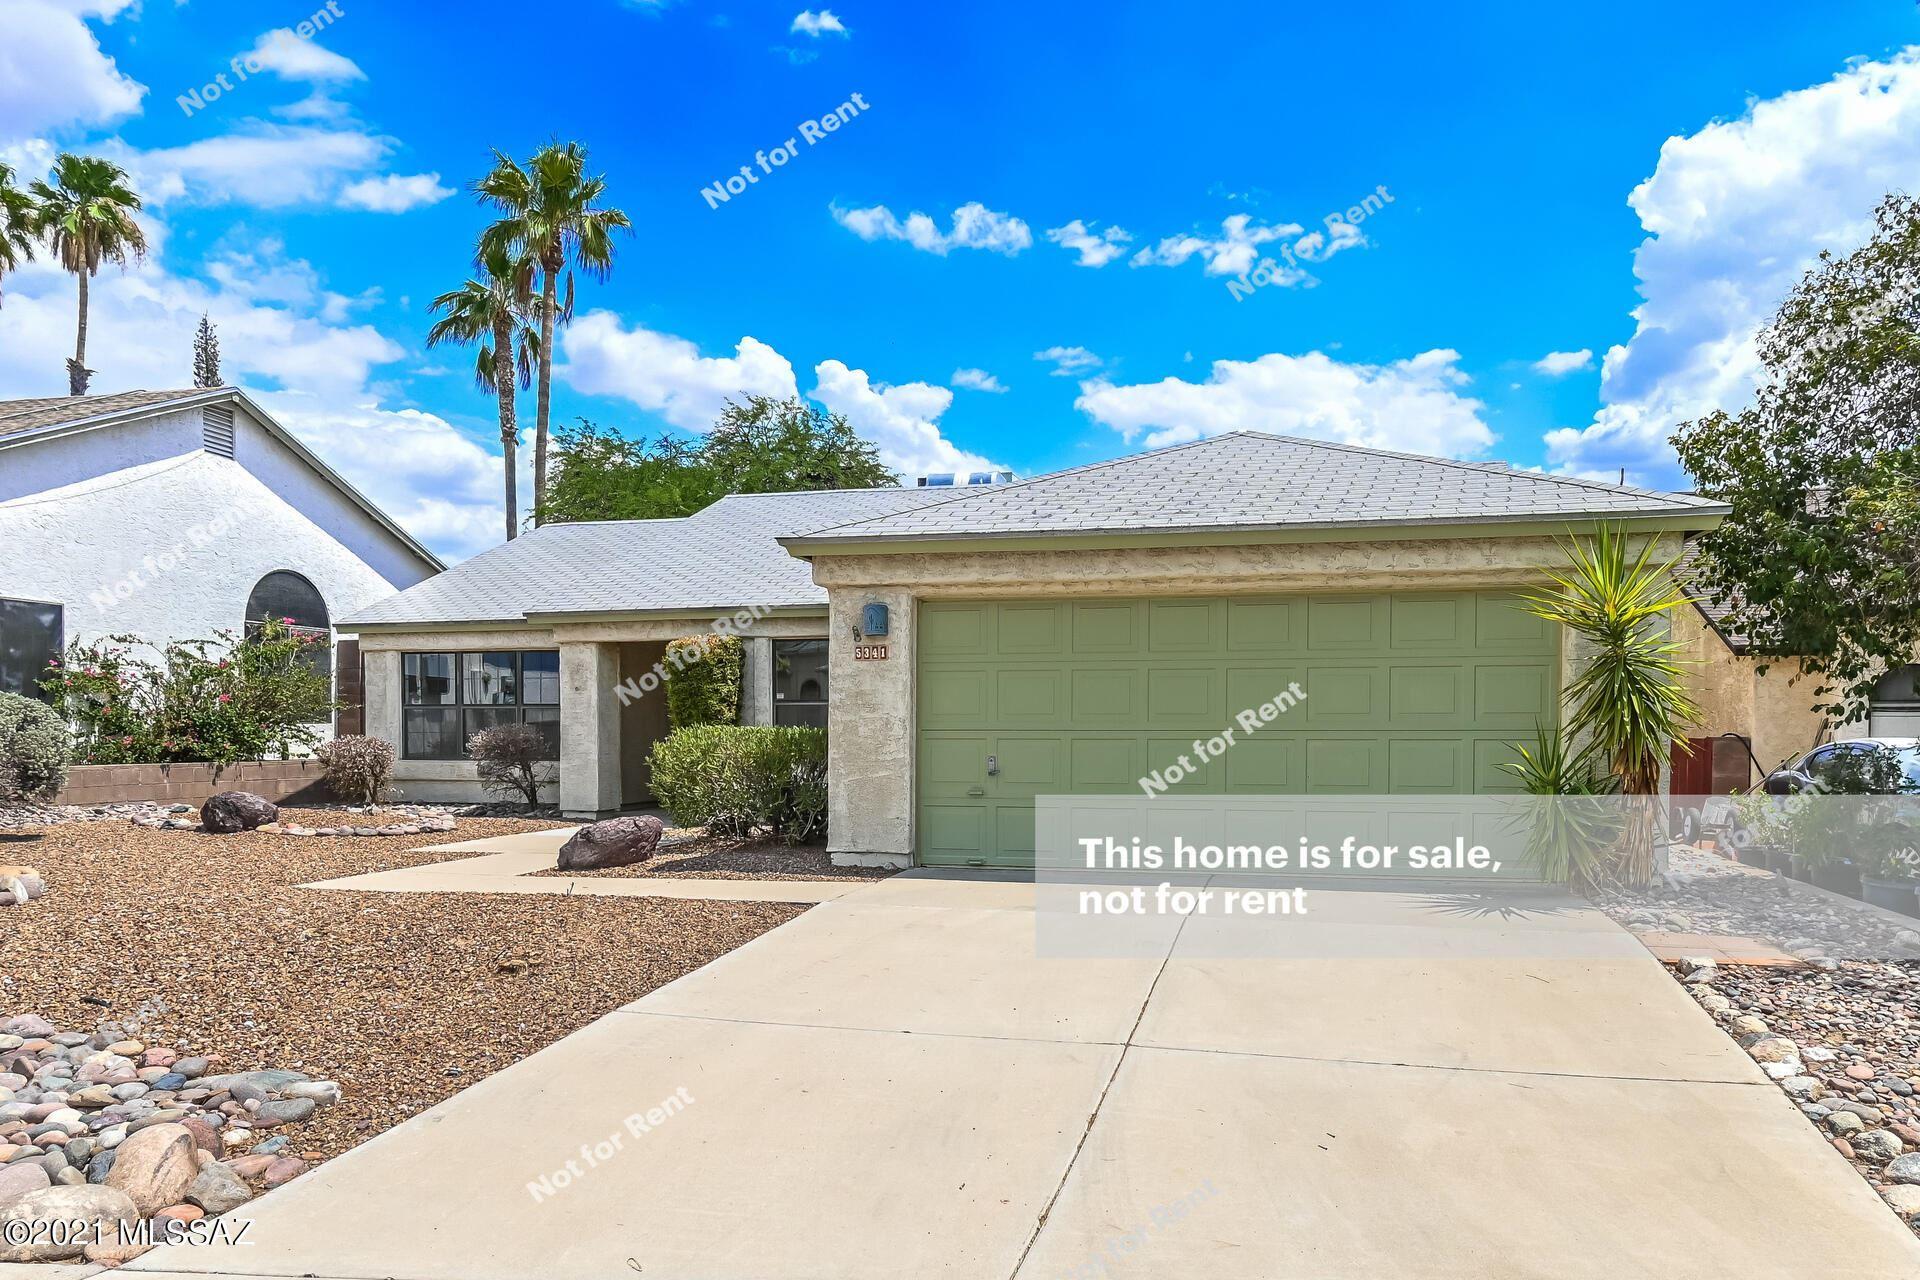 5341 W Eaglestone Loop, Tucson, AZ 85742 - MLS#: 22117682